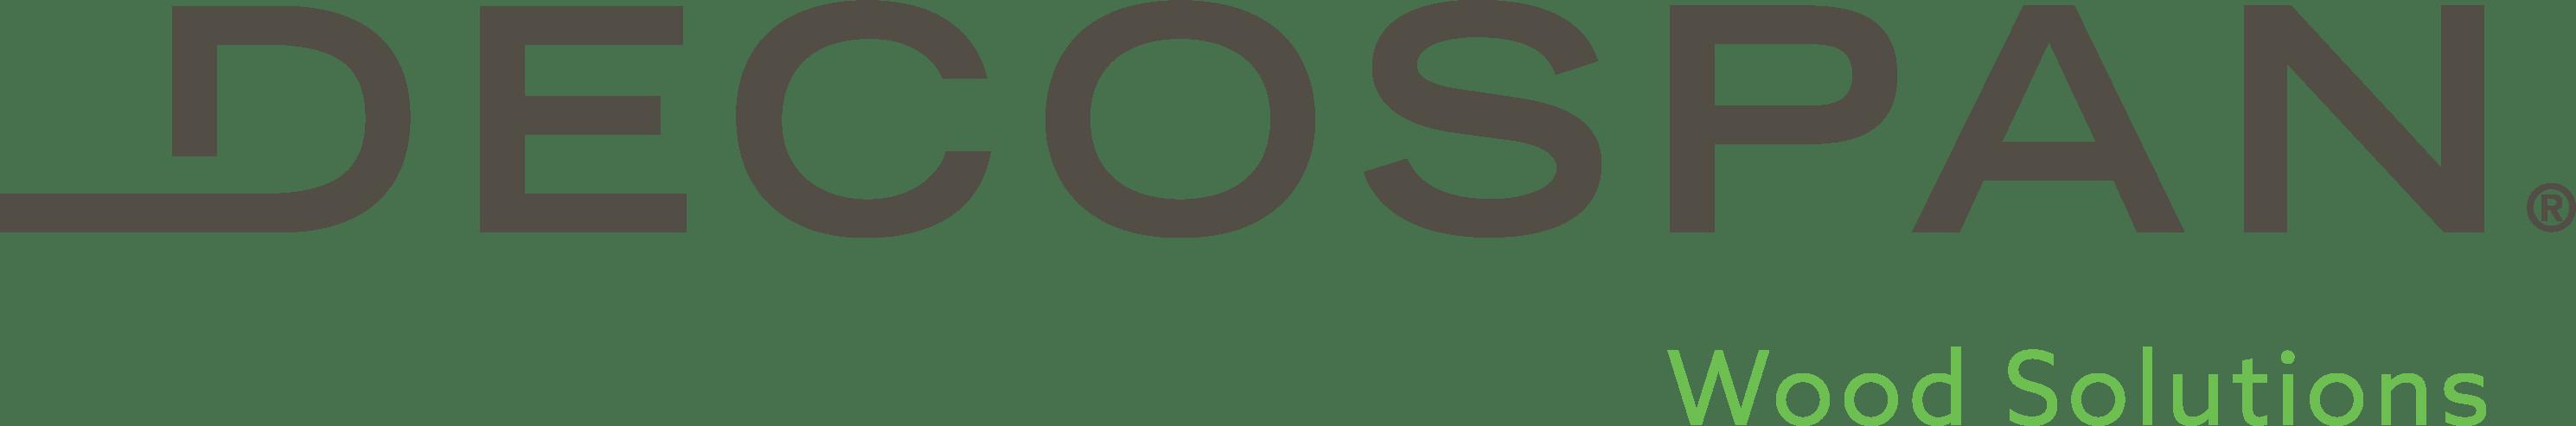 Logo Decospan Wood Solutions matériauthèque